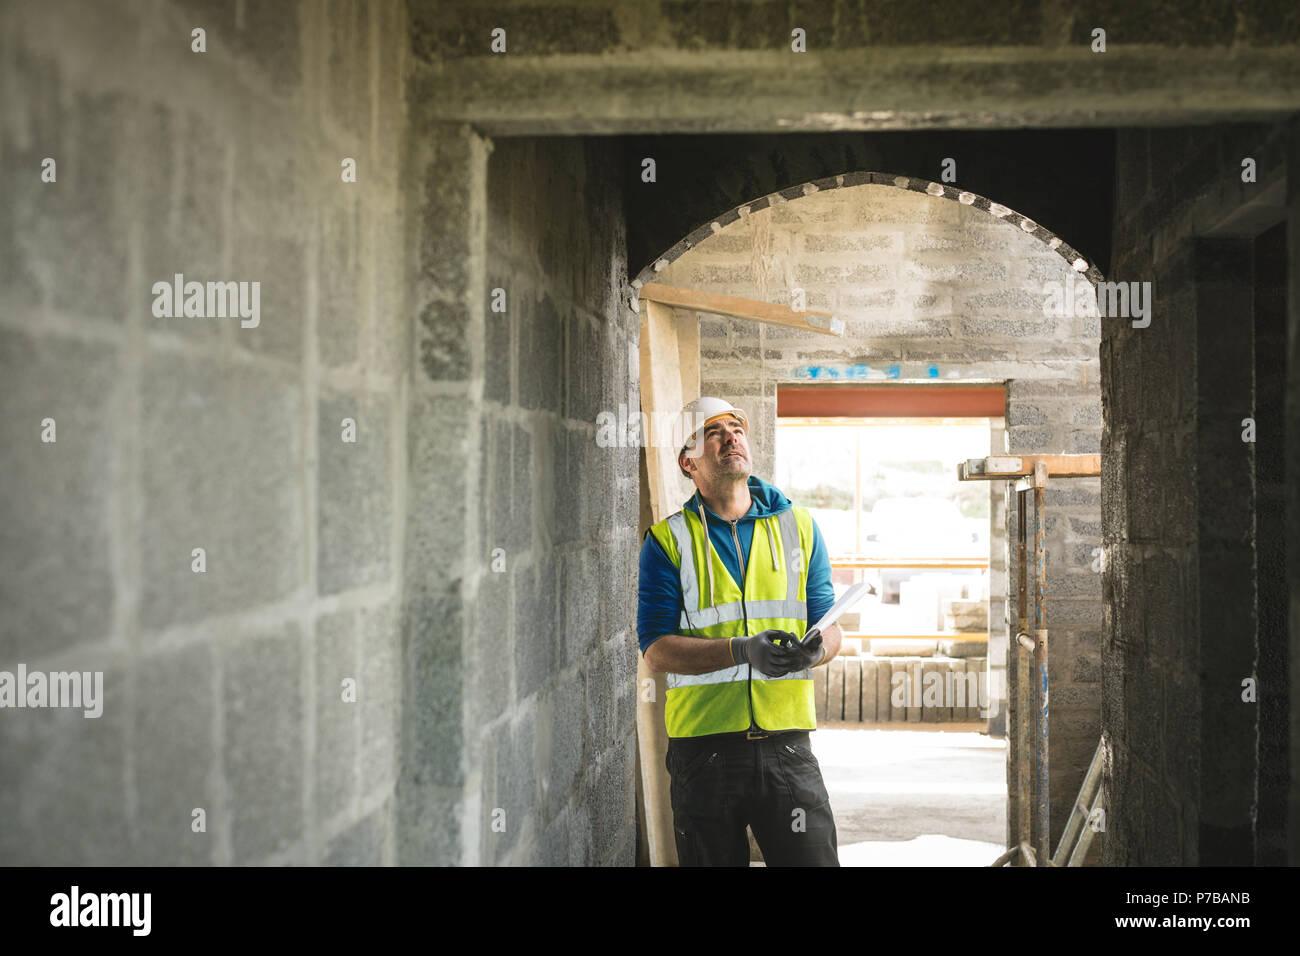 Ingeniero mirando en la puerta Imagen De Stock